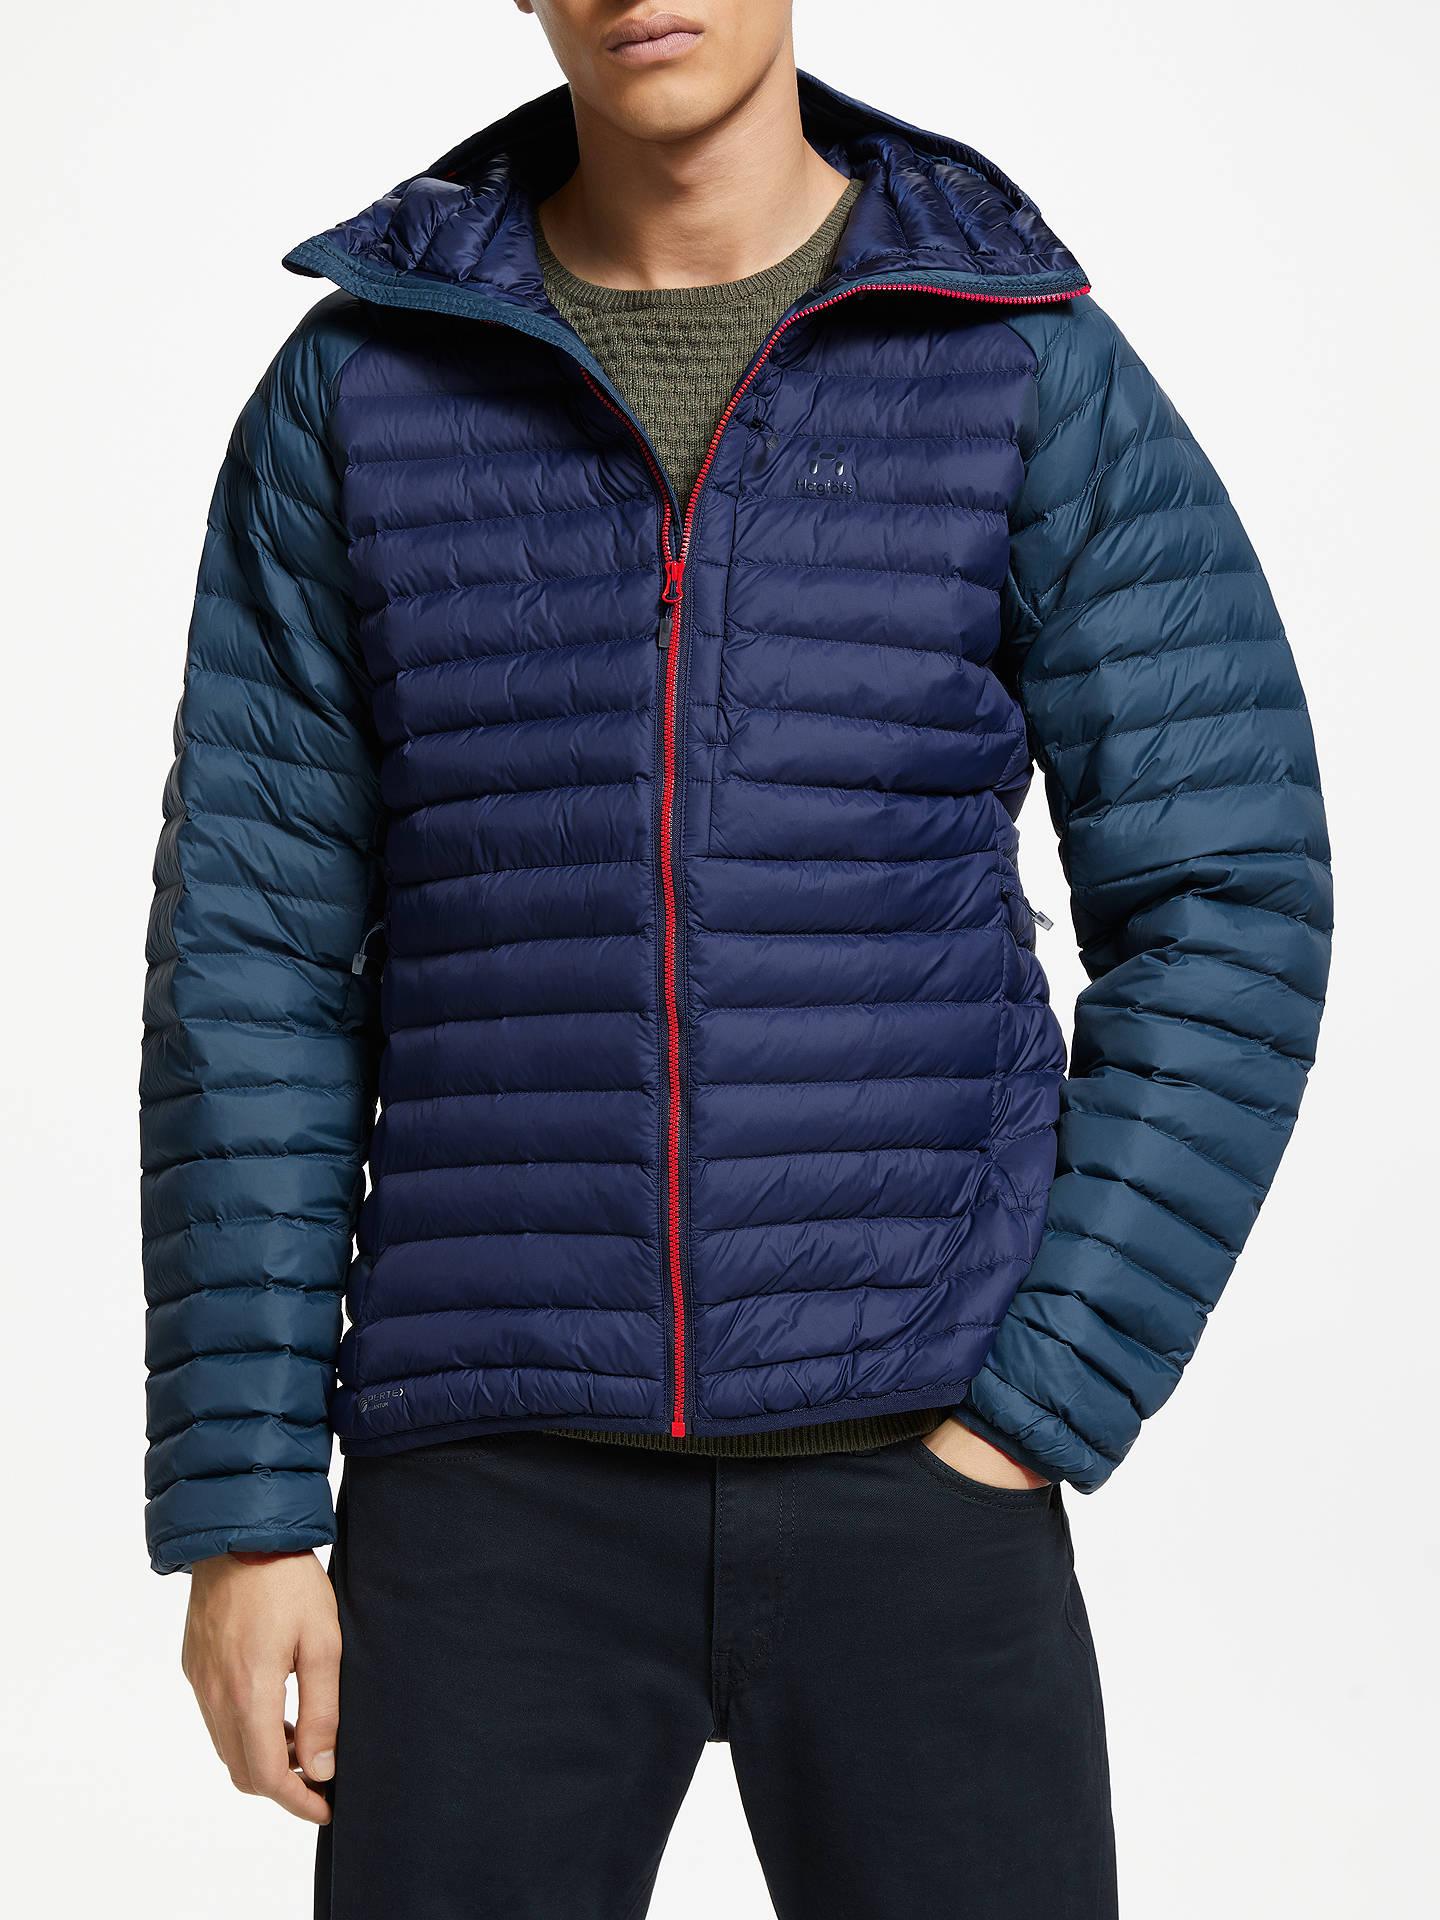 817694178ef Buy Haglöfs Essens Mimic Men's Insulated Jacket, Tarn Blue/Blue Ink, L  Online ...